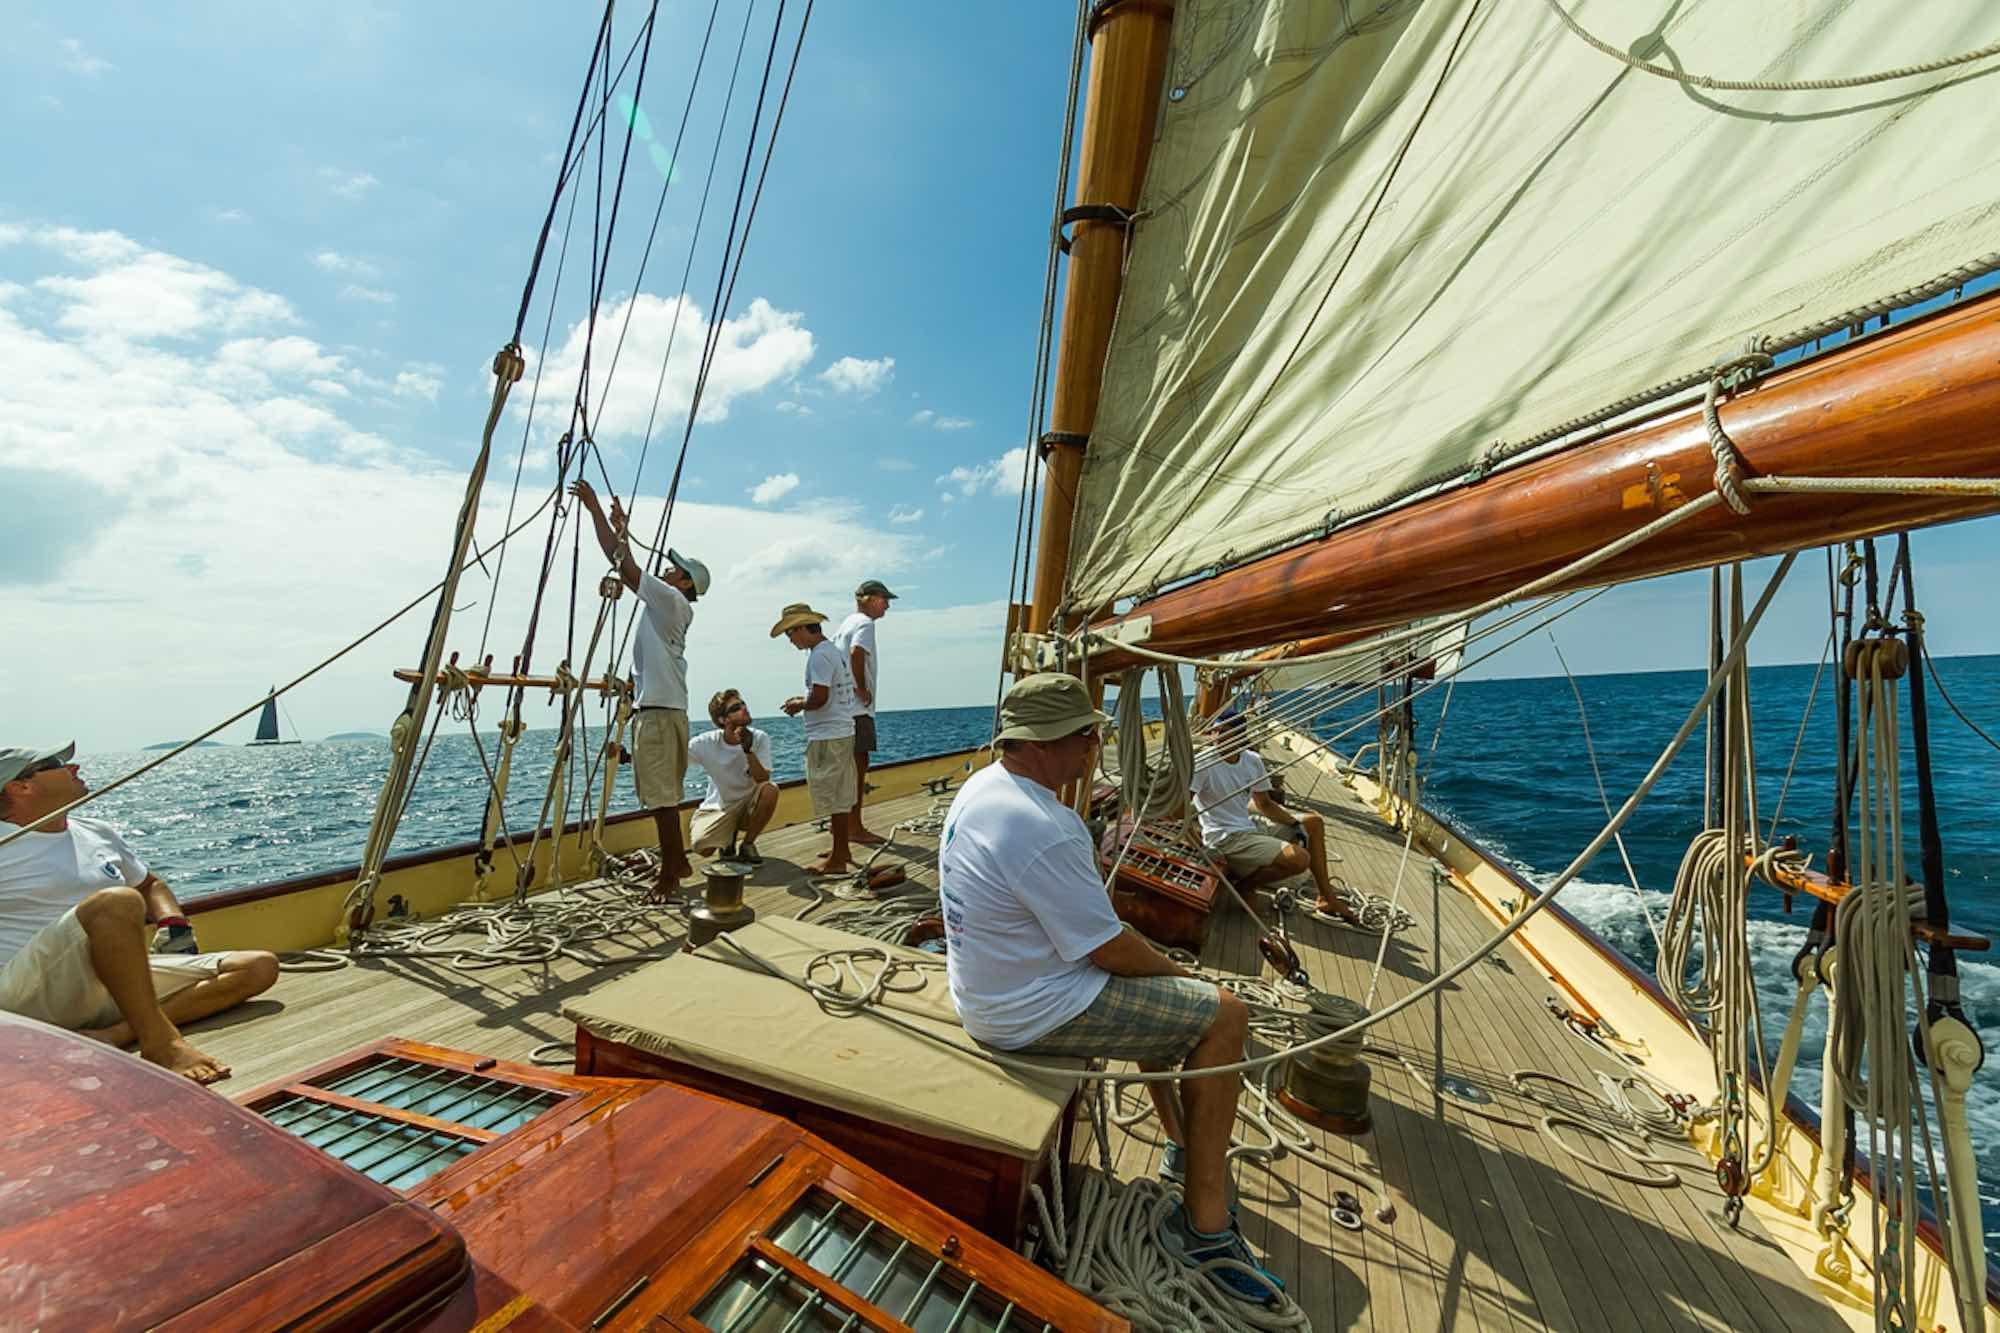 asia superyacht rendezvous 2014 sunshine (14).jpeg